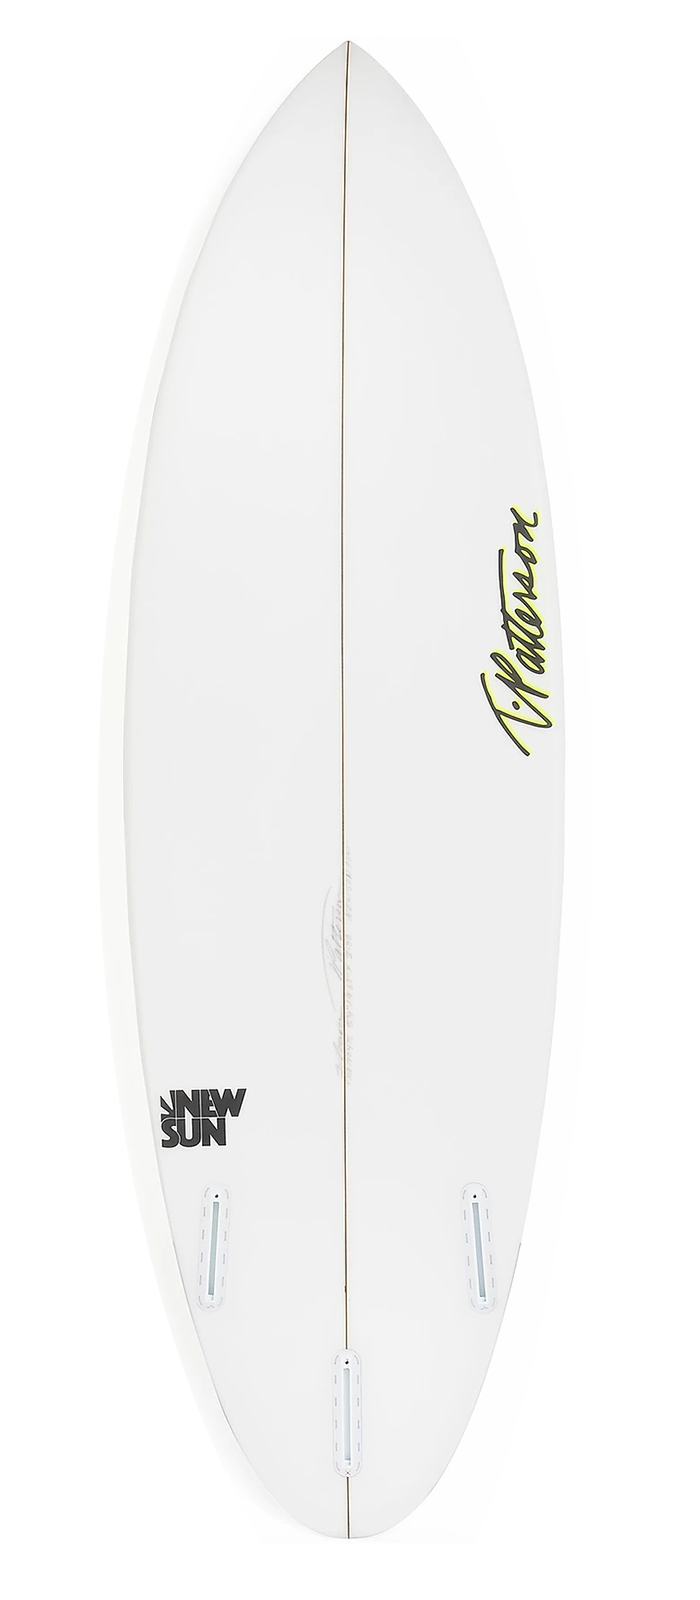 NEW SUN surfboard model bottom